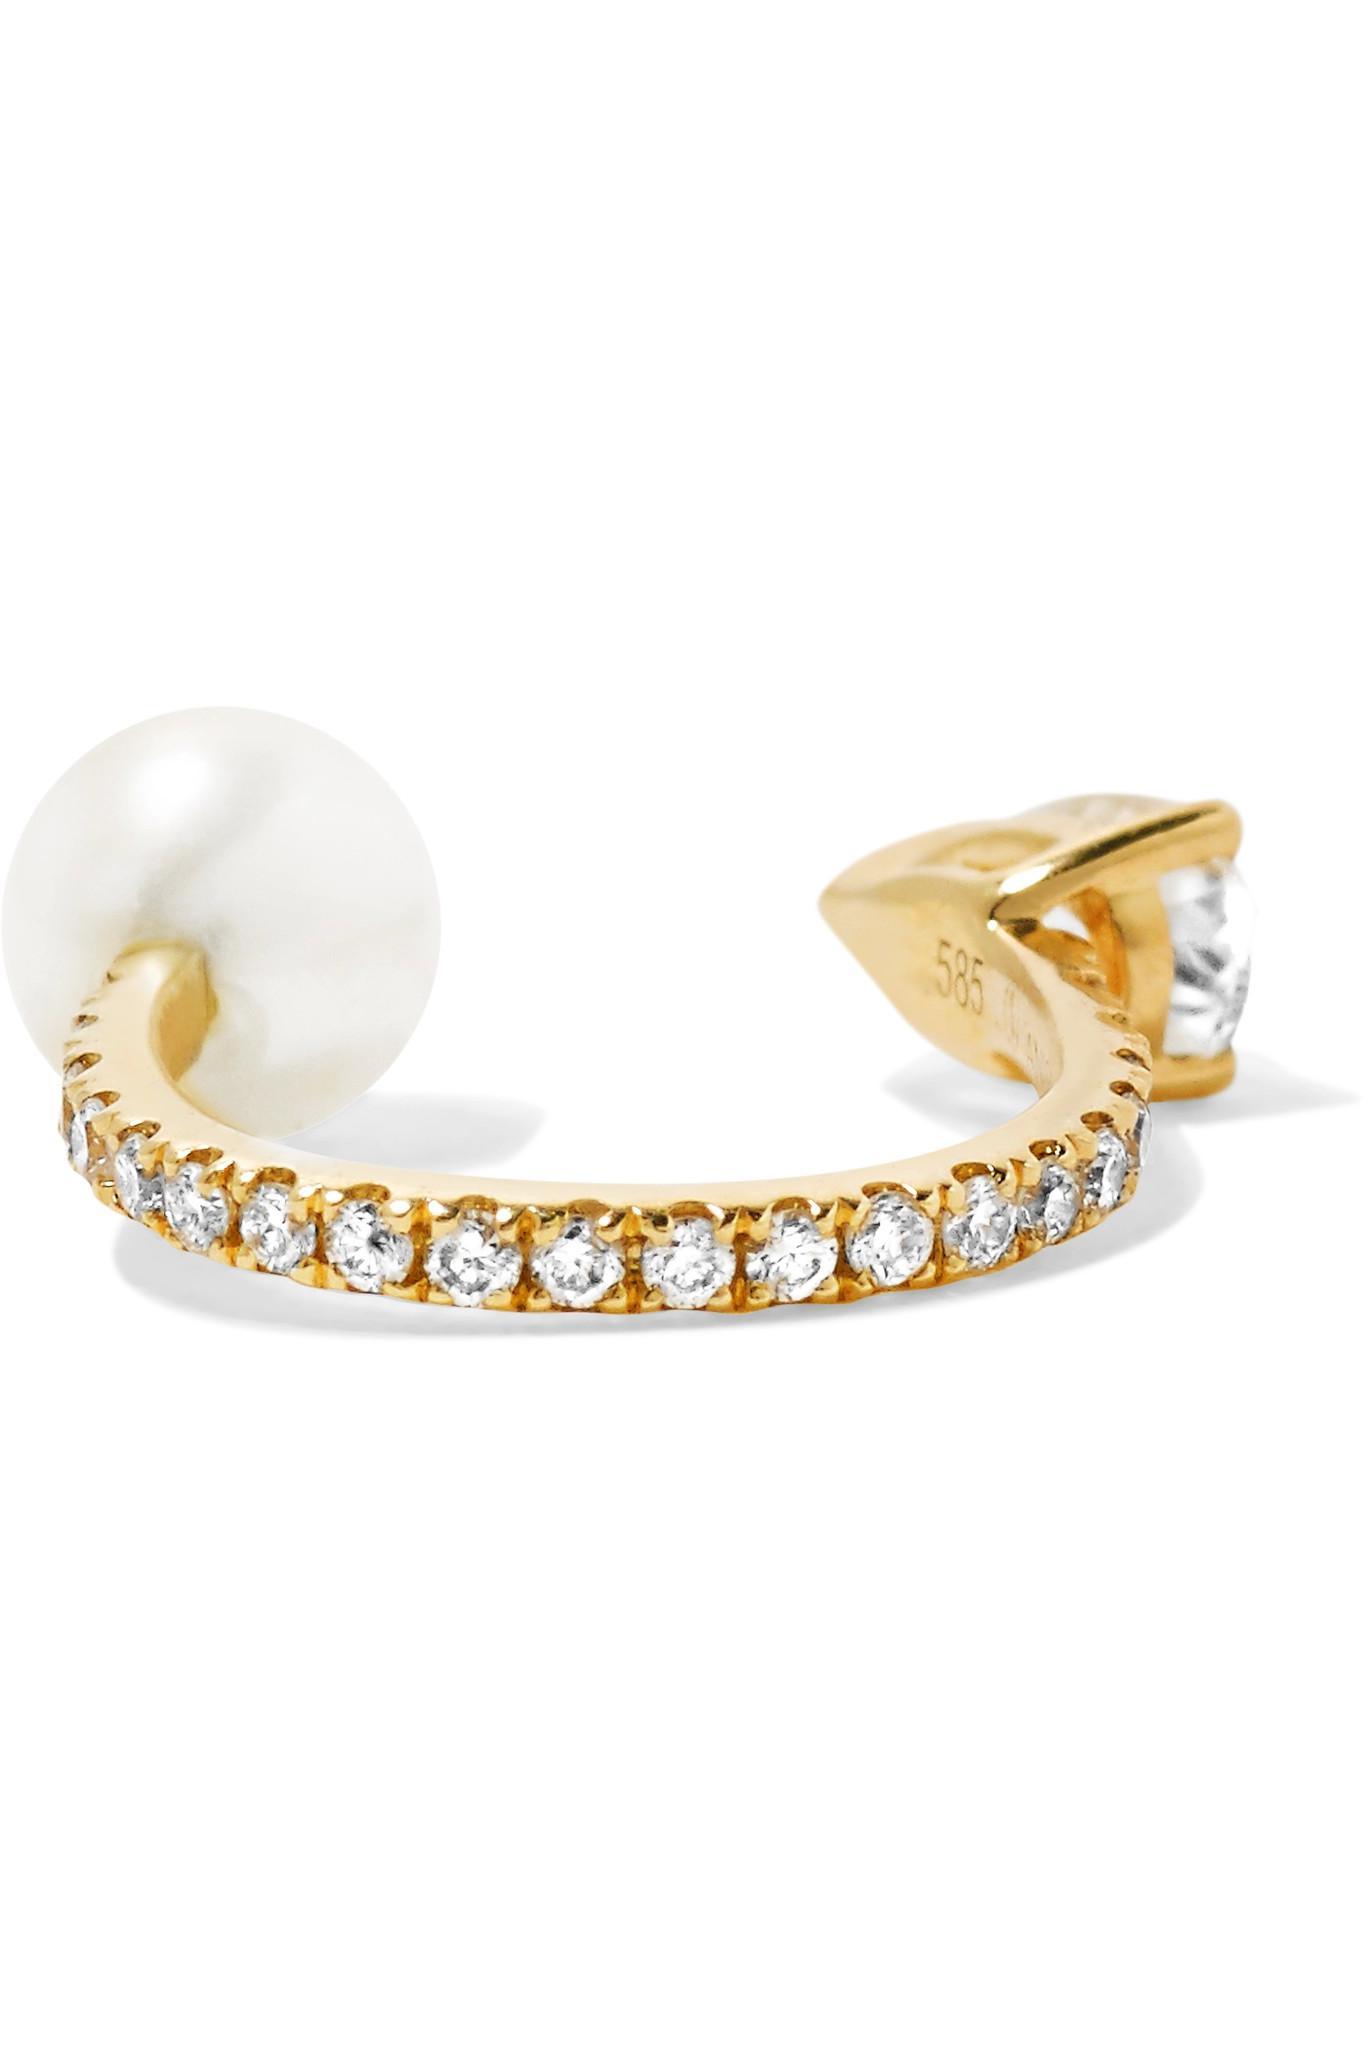 Anissa Kermiche Perle Rare 14-karat Gold Multi-stone Ear Cuff XbyEp